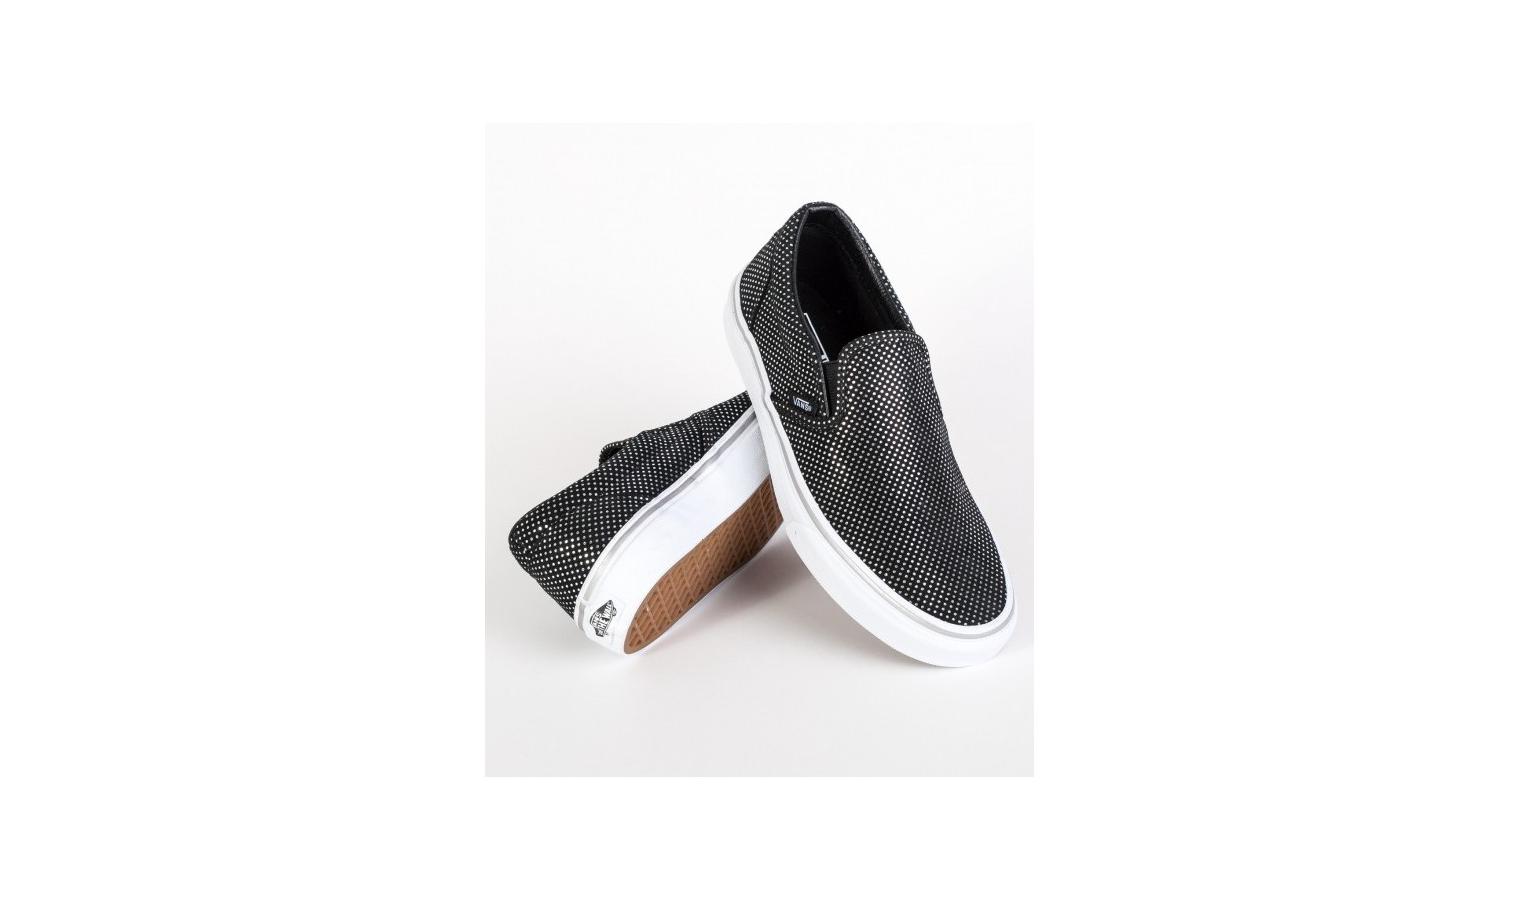 Dámské slip-on boty Vans UA CLASSIC SLIP-ON (METALLIC DOTS) černé ... 617bd395abc